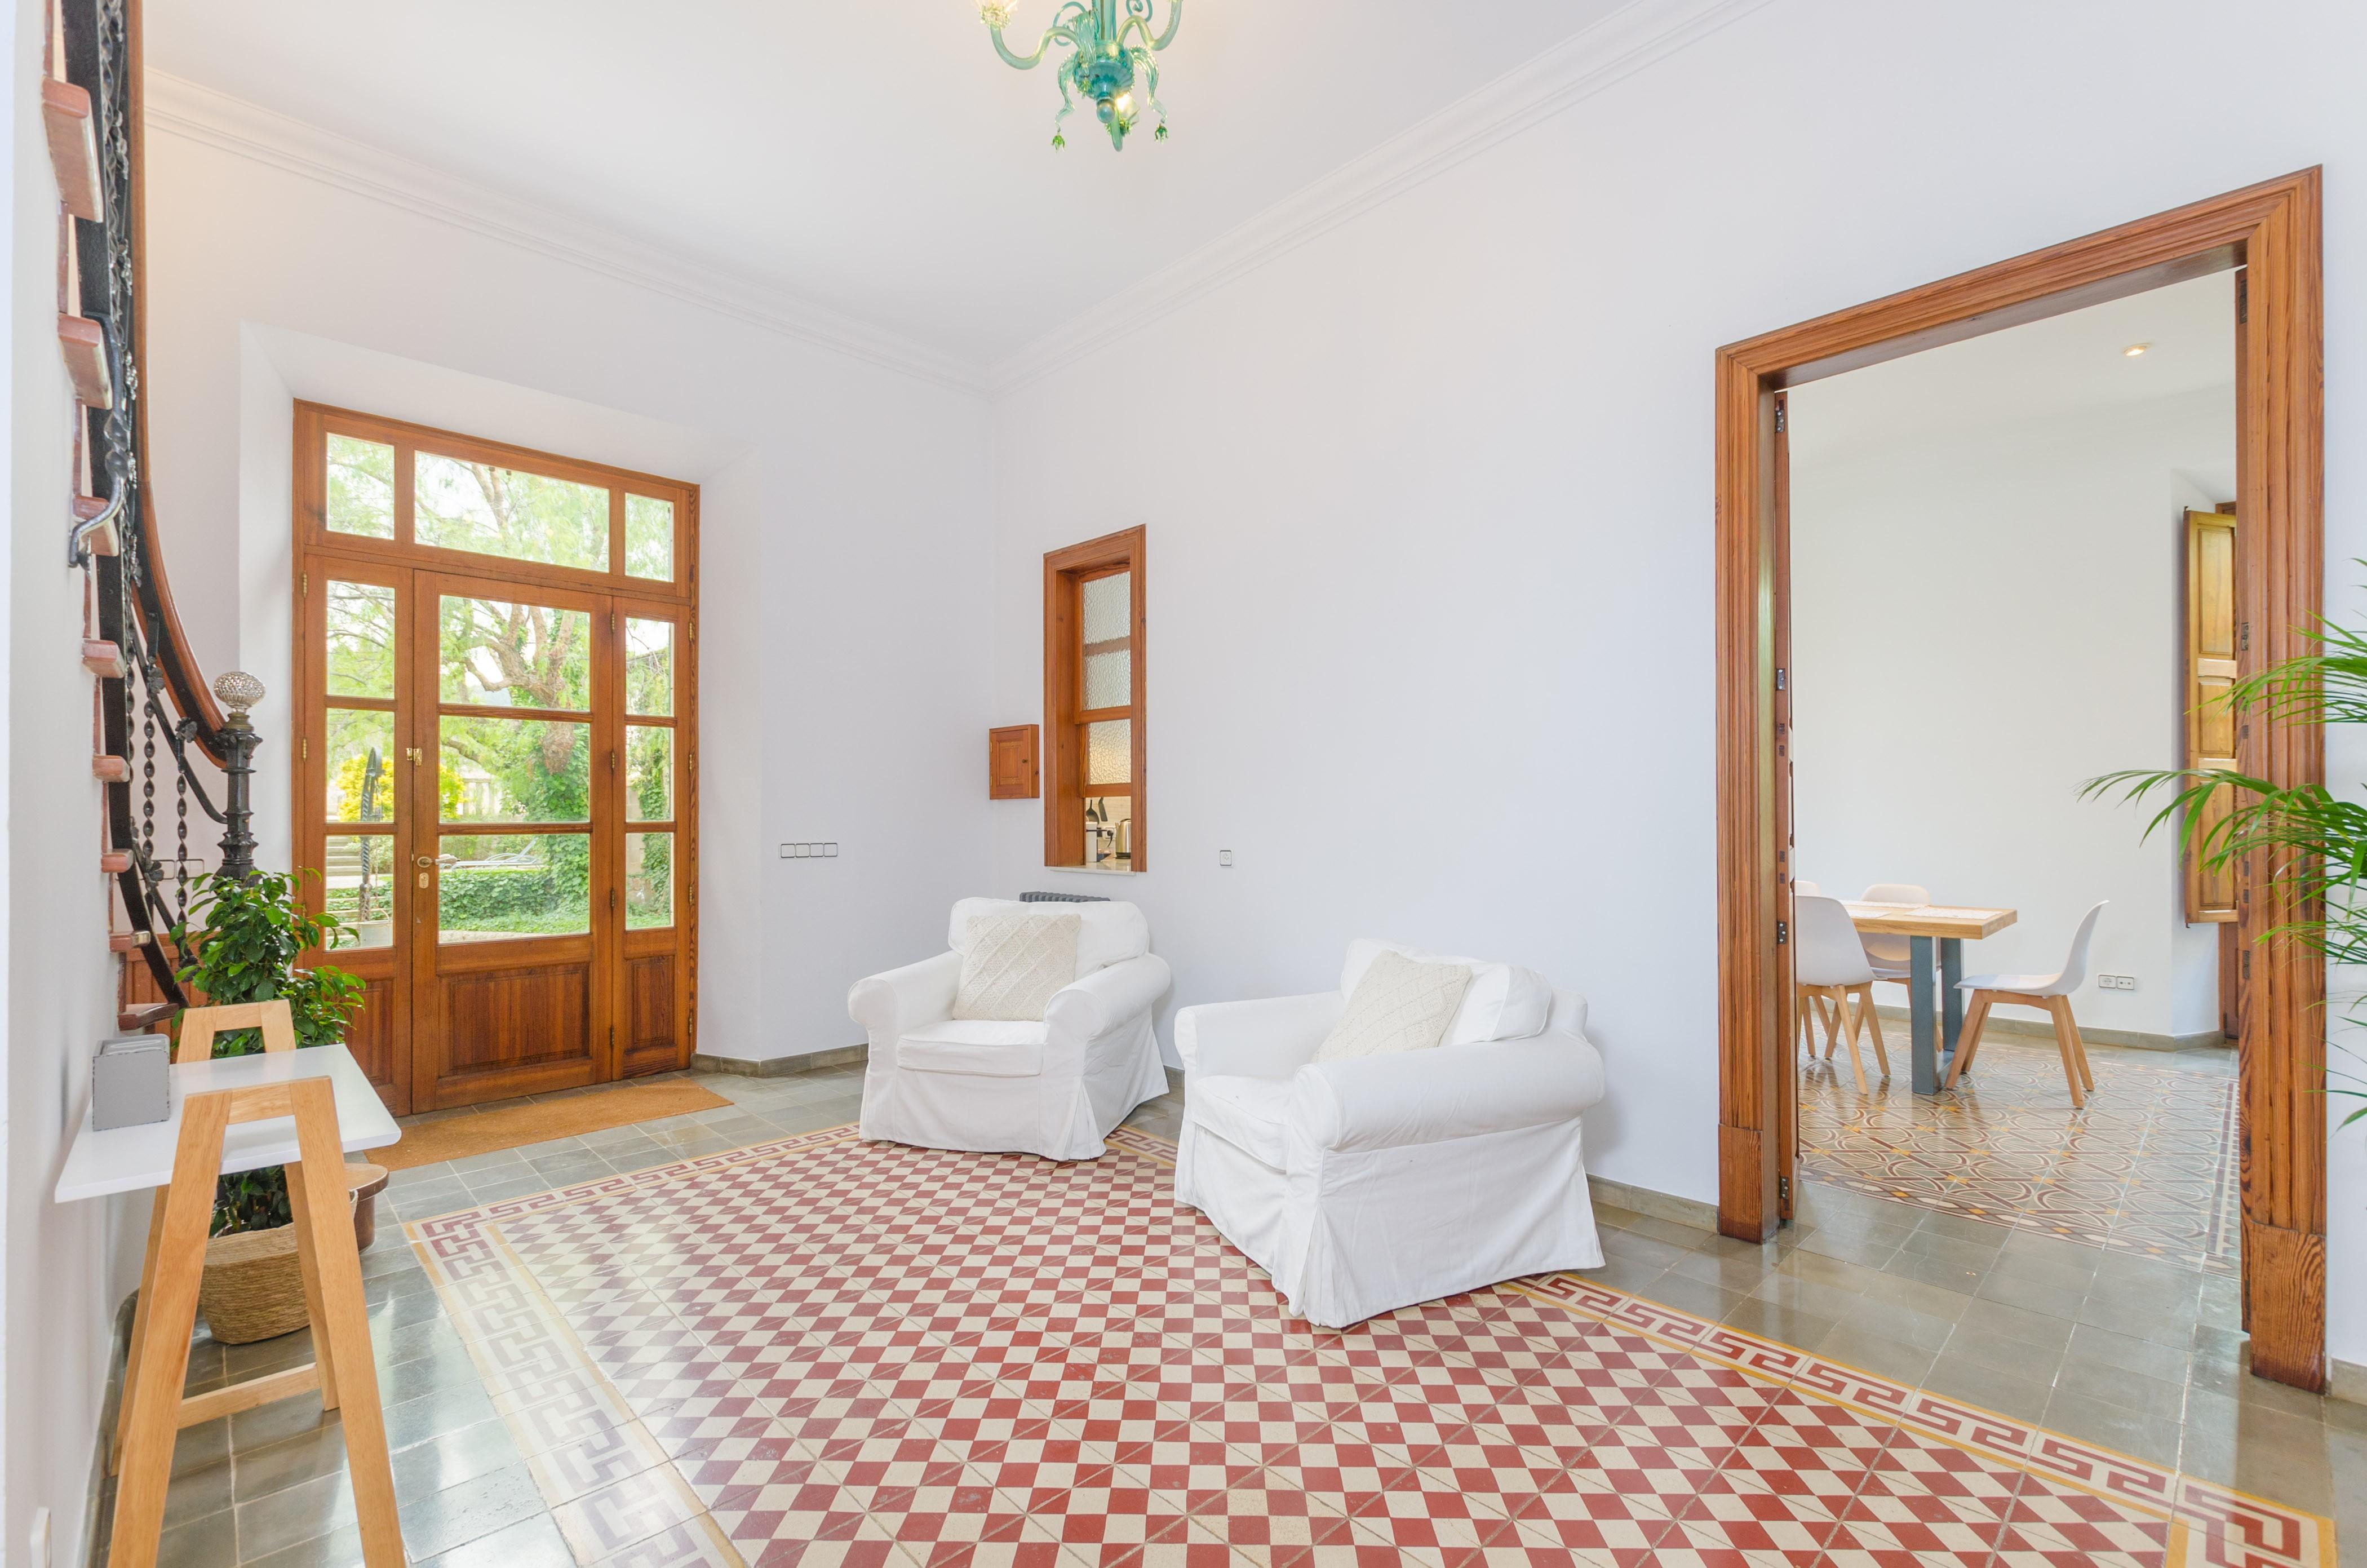 Maison de vacances CAS CONVIDATS (2435013), Alaro, Majorque, Iles Baléares, Espagne, image 38